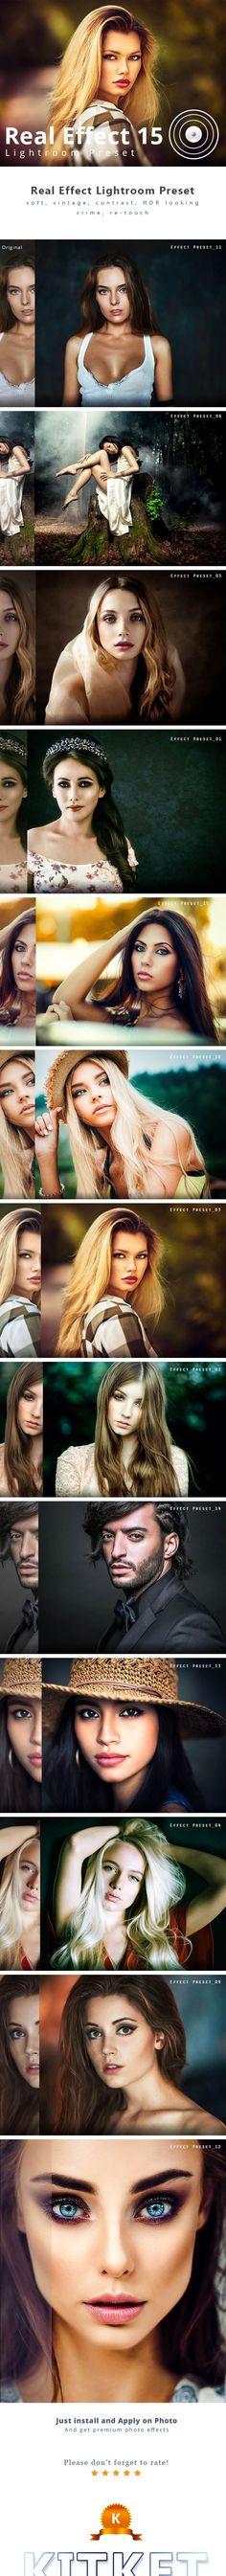 Real Effect 15 Photography Lightroom Preset - Lightroom Presets Add-ons